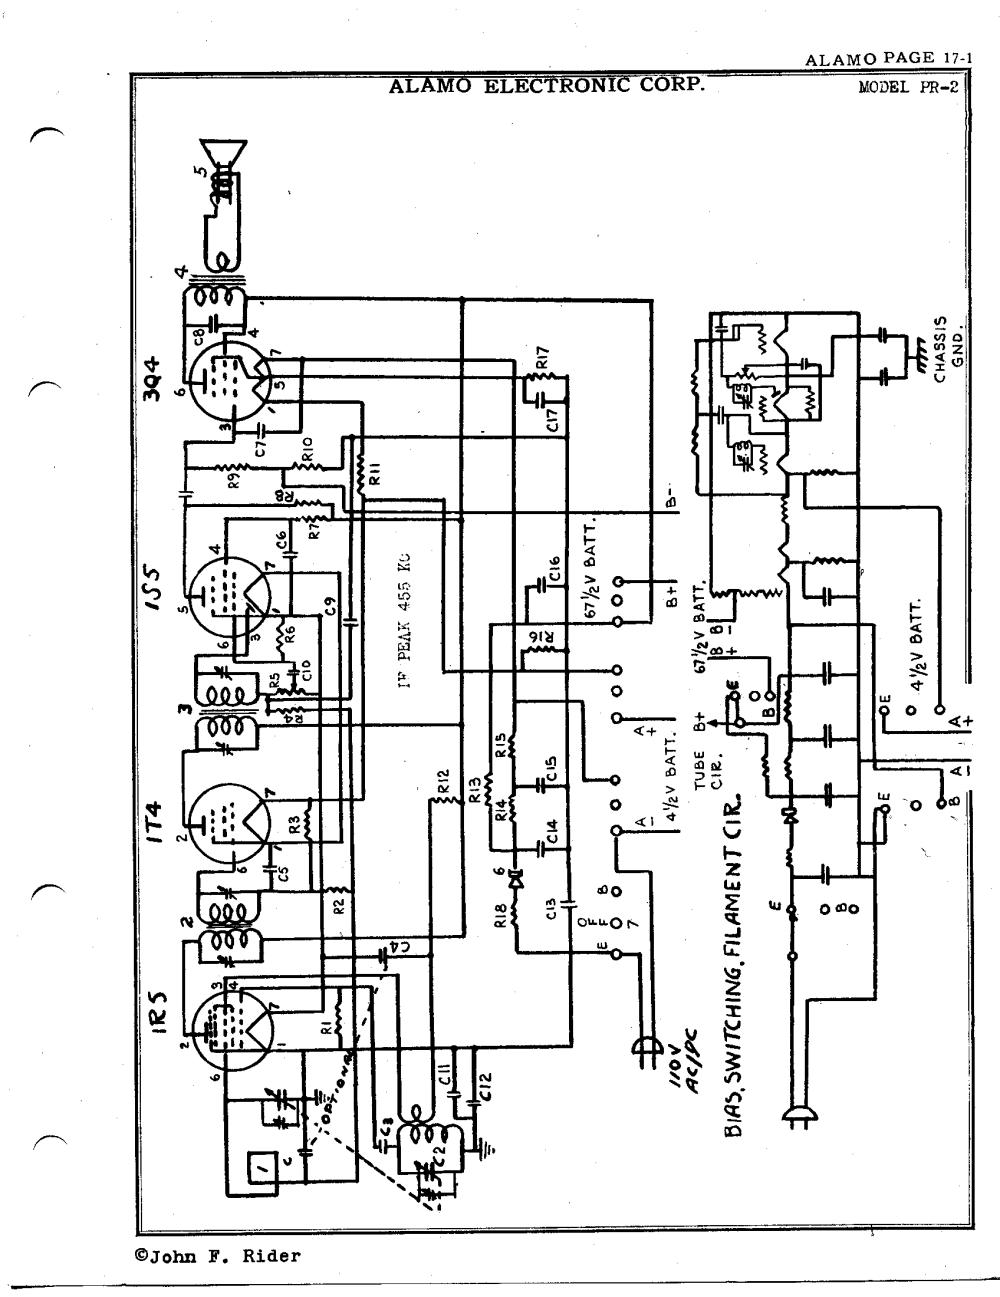 medium resolution of alamo amp schematics wiring diagram home alamo amp schematics